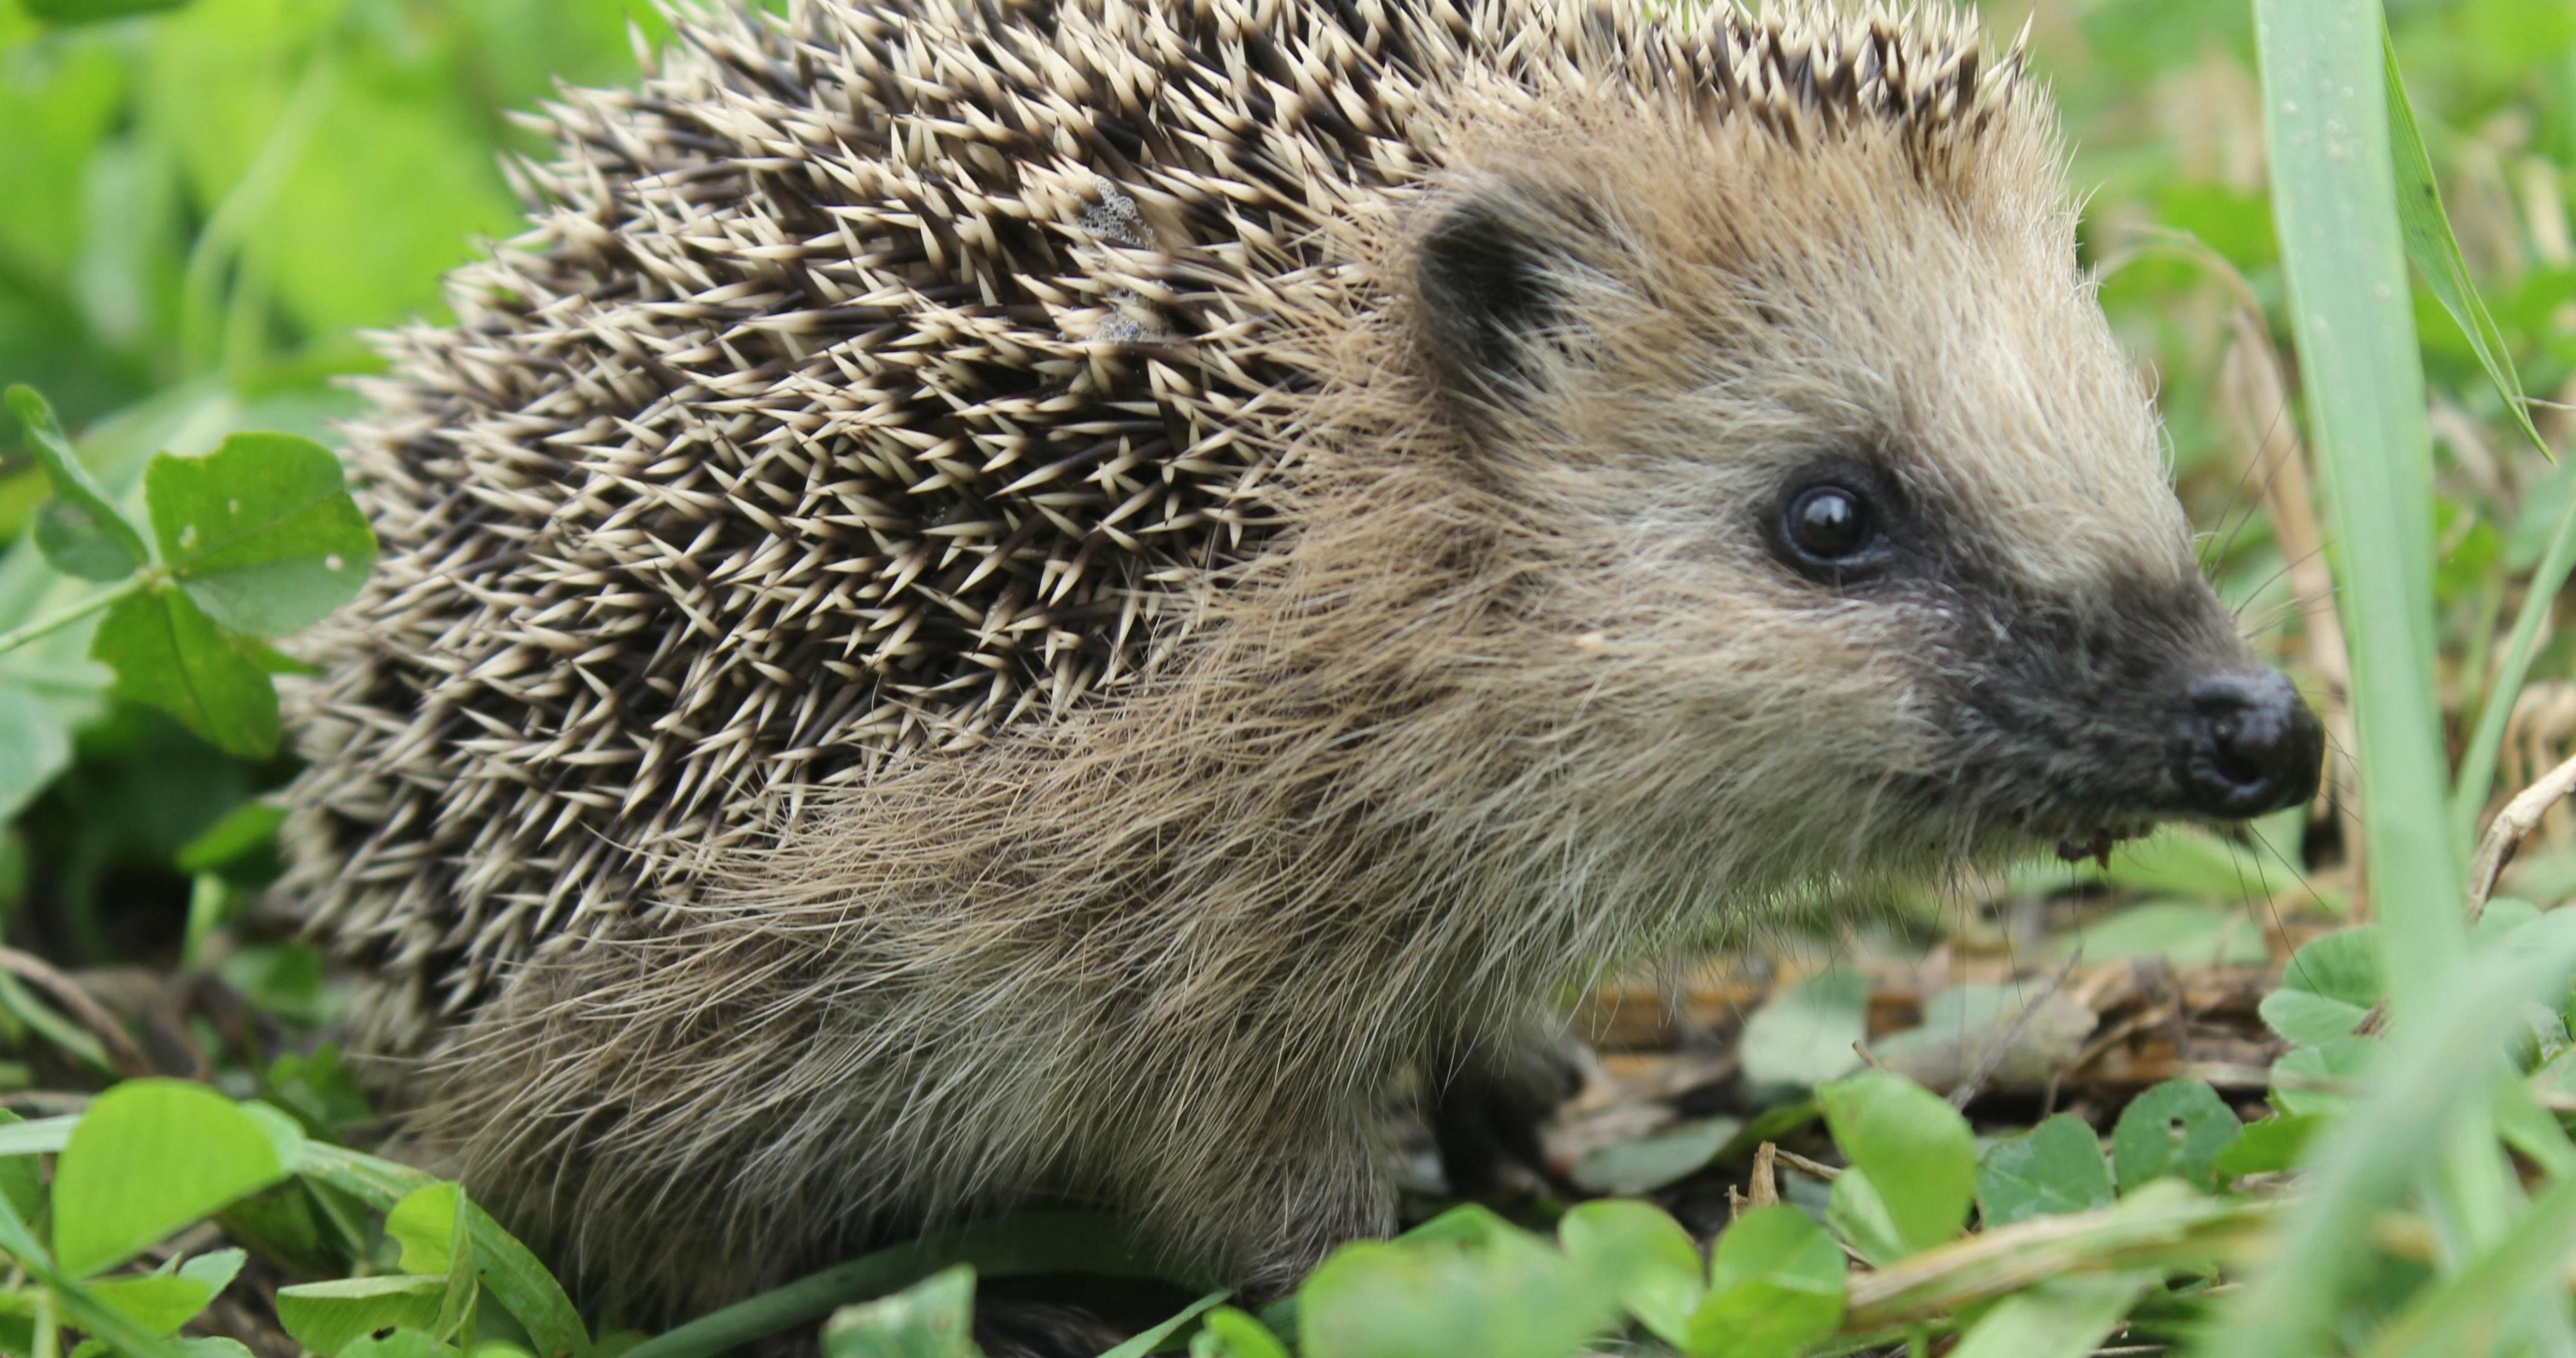 Hedgehog Animal Hd 4k Ultra Hd Wallpaper - 4k Hedgehog , HD Wallpaper & Backgrounds